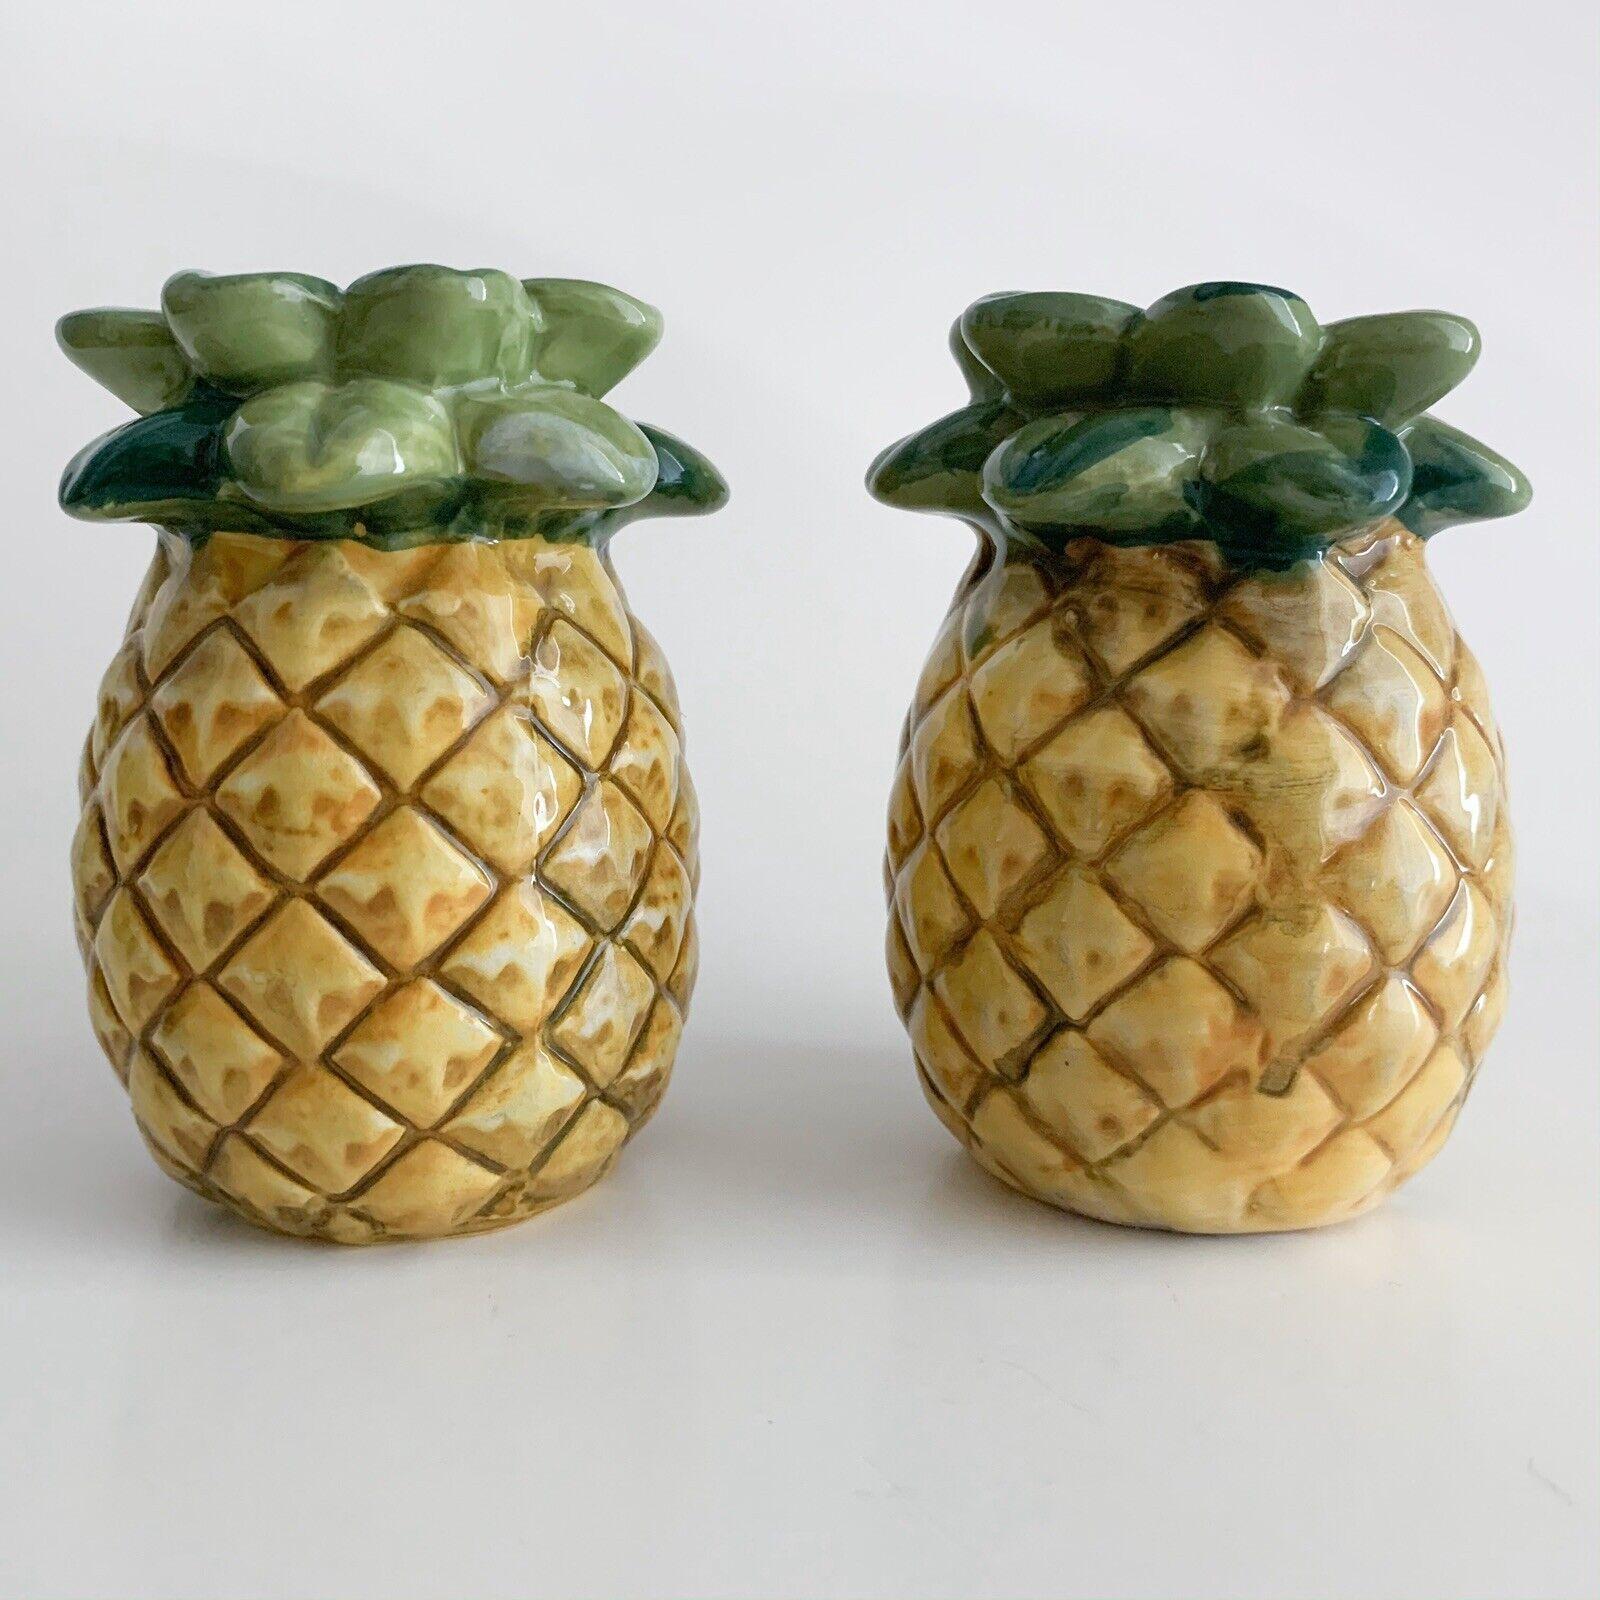 Hula Girl and Pineapple Salt and Pepper Shakers Aloha Tropical Salt and Pepper Shakers Fruit Salt and Pepper Shakers Hawaii